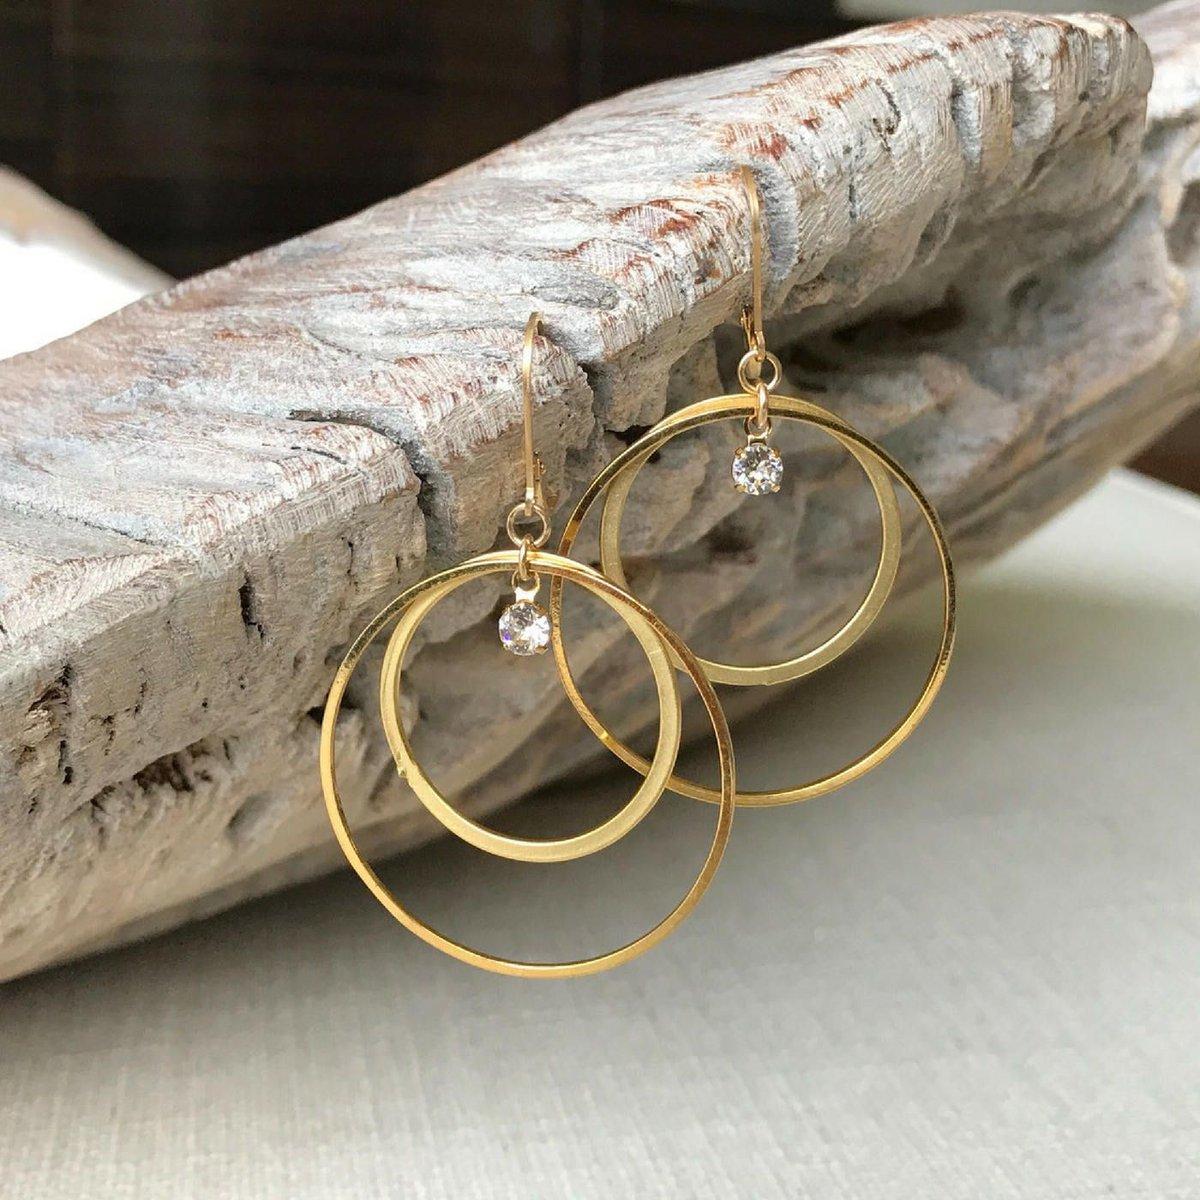 Large Gold Hoops  http:// bit.ly/2zNOdyG  &nbsp;   @etsy #snrtg #jewelry #gifts #momlife #epiconetsy #artisnabot #etsyaaa #boho #RTplease #bizrt #ATSocialMedia <br>http://pic.twitter.com/6ro47j8rAL